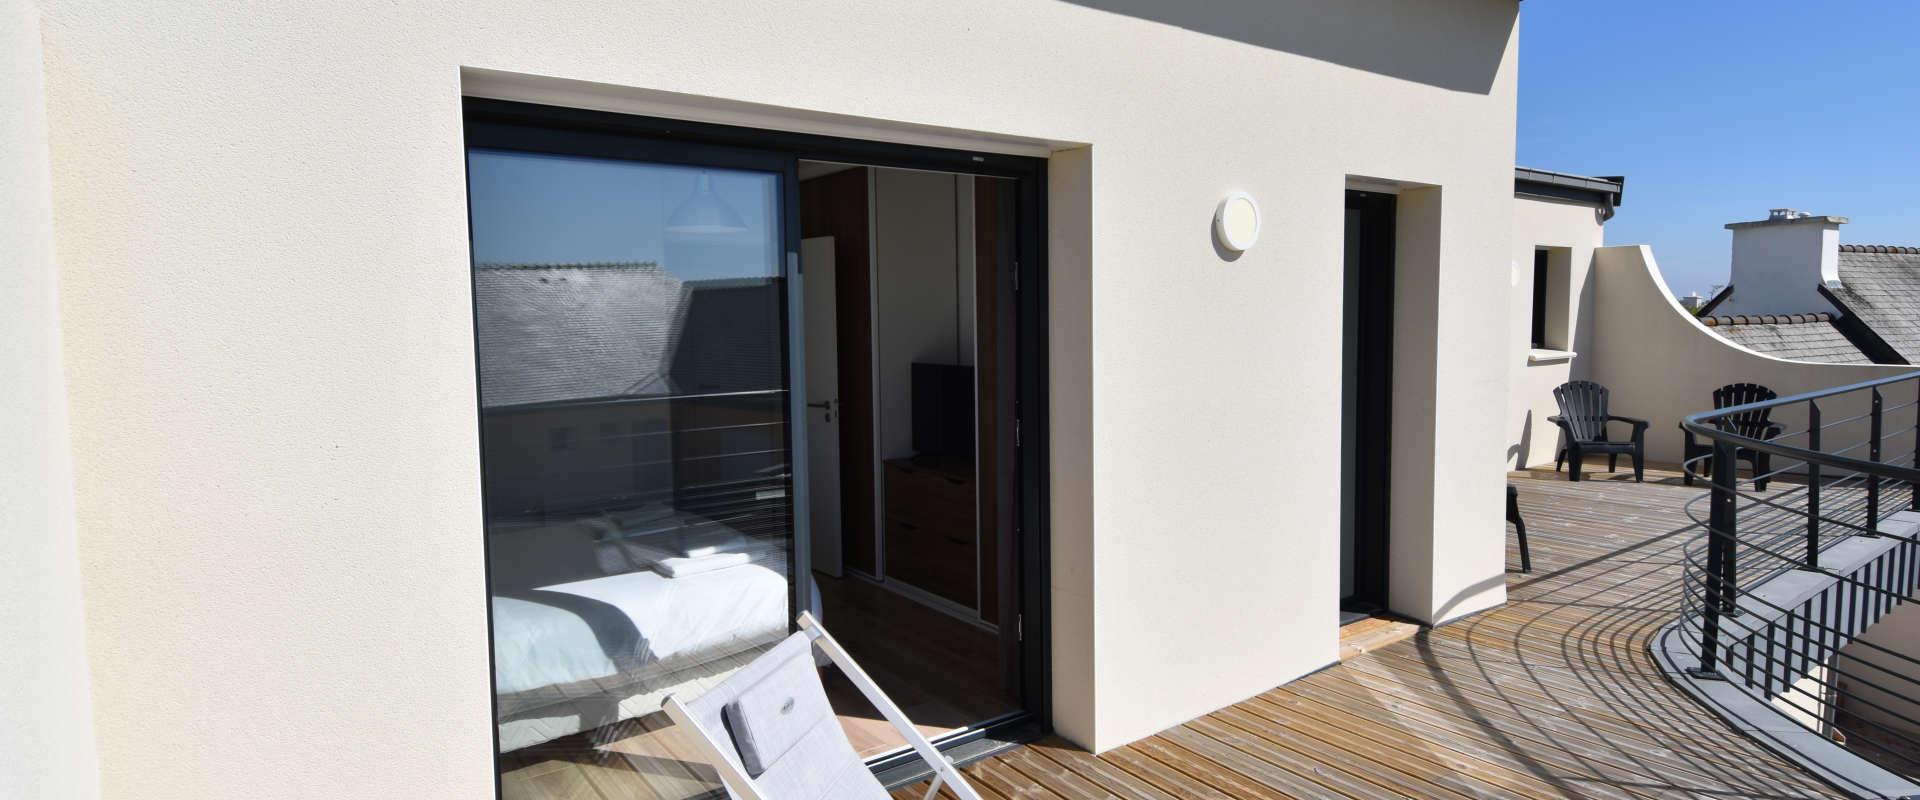 villa-des-marins-pecheurs-14-terrasse-etage.jpg